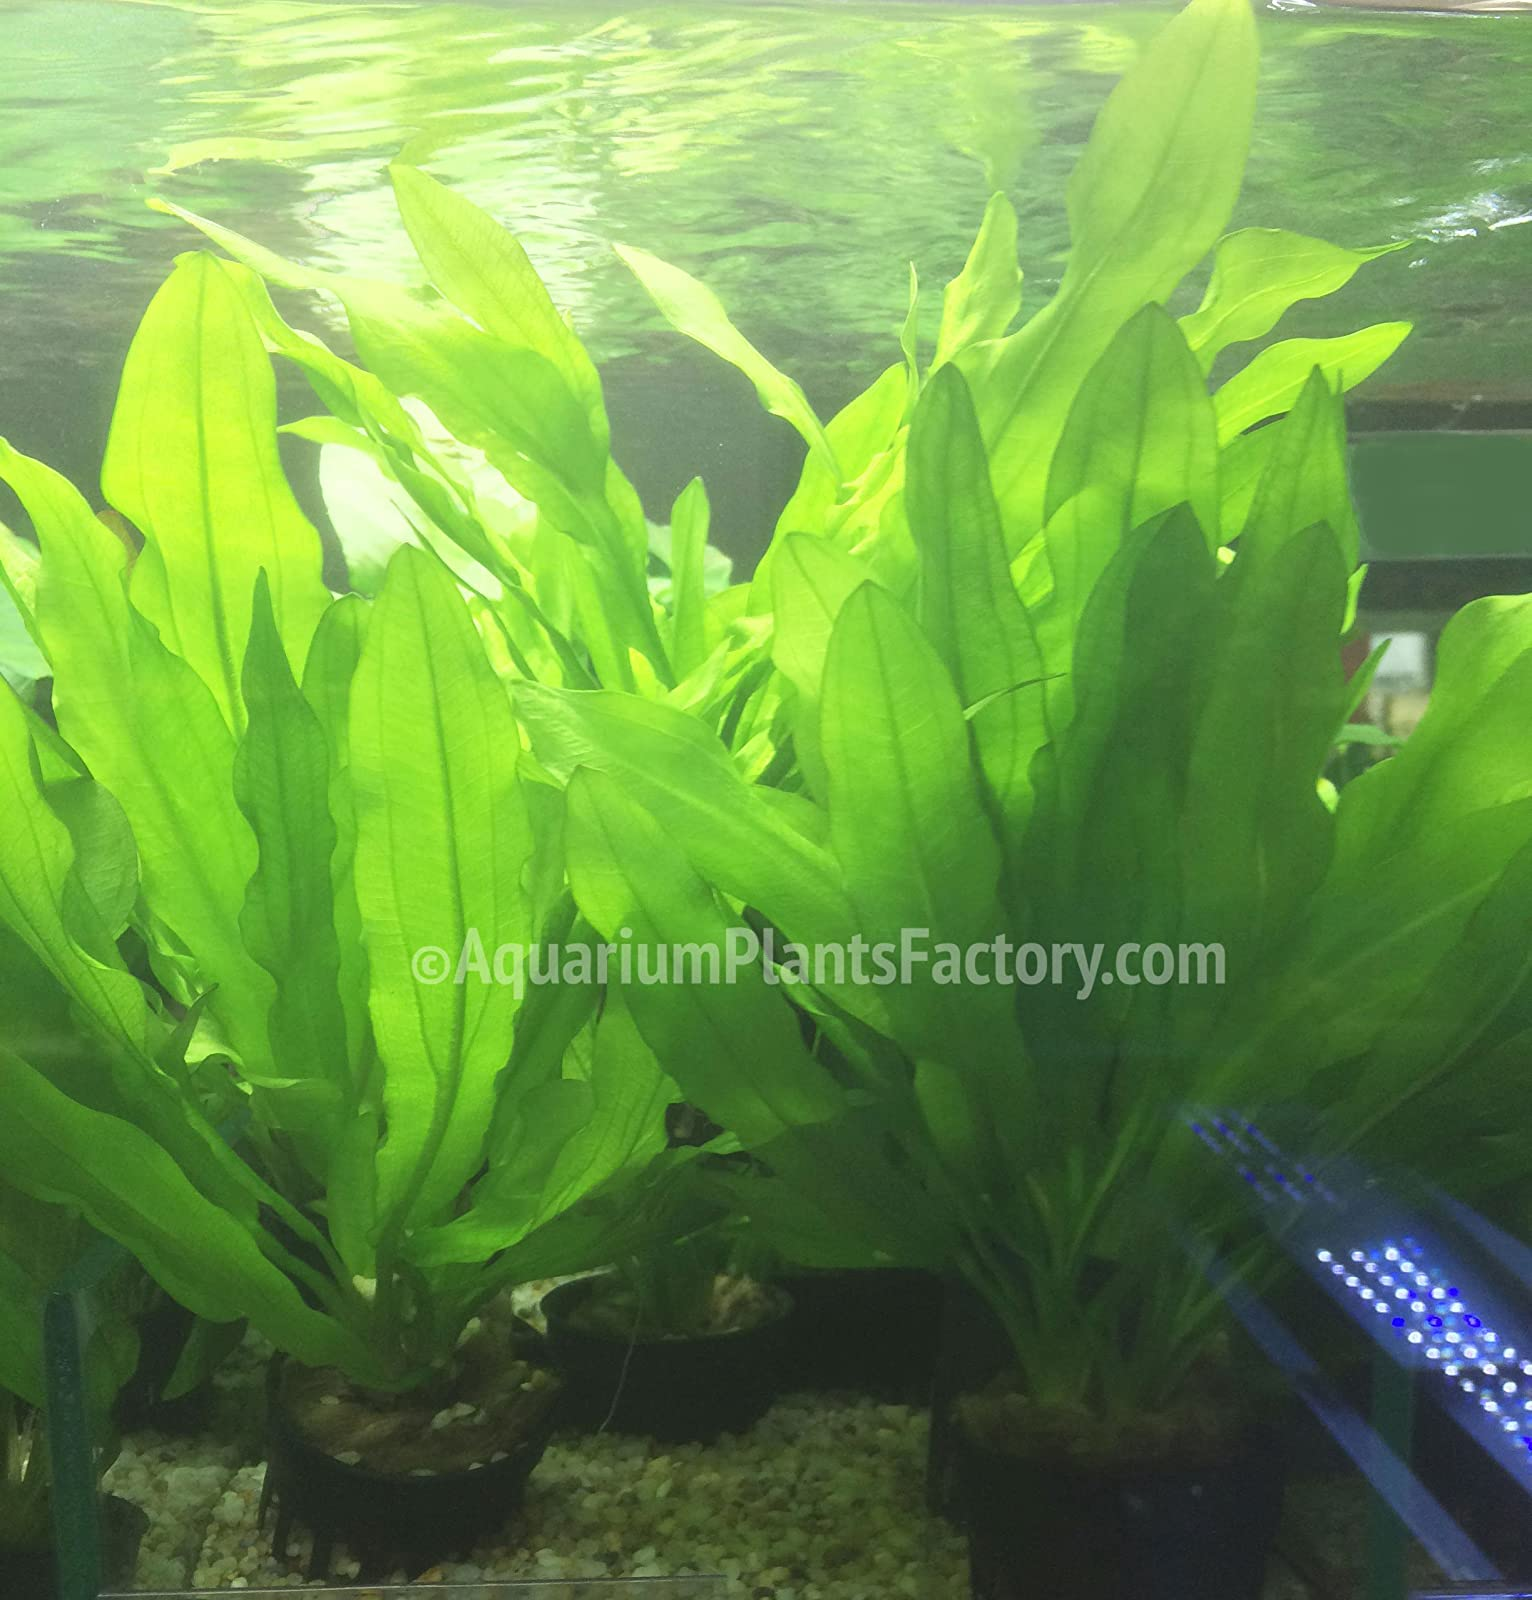 AquariumPlantsFactory - Ruffled Amazon Sword Potted (Echinodorus Martii - 1